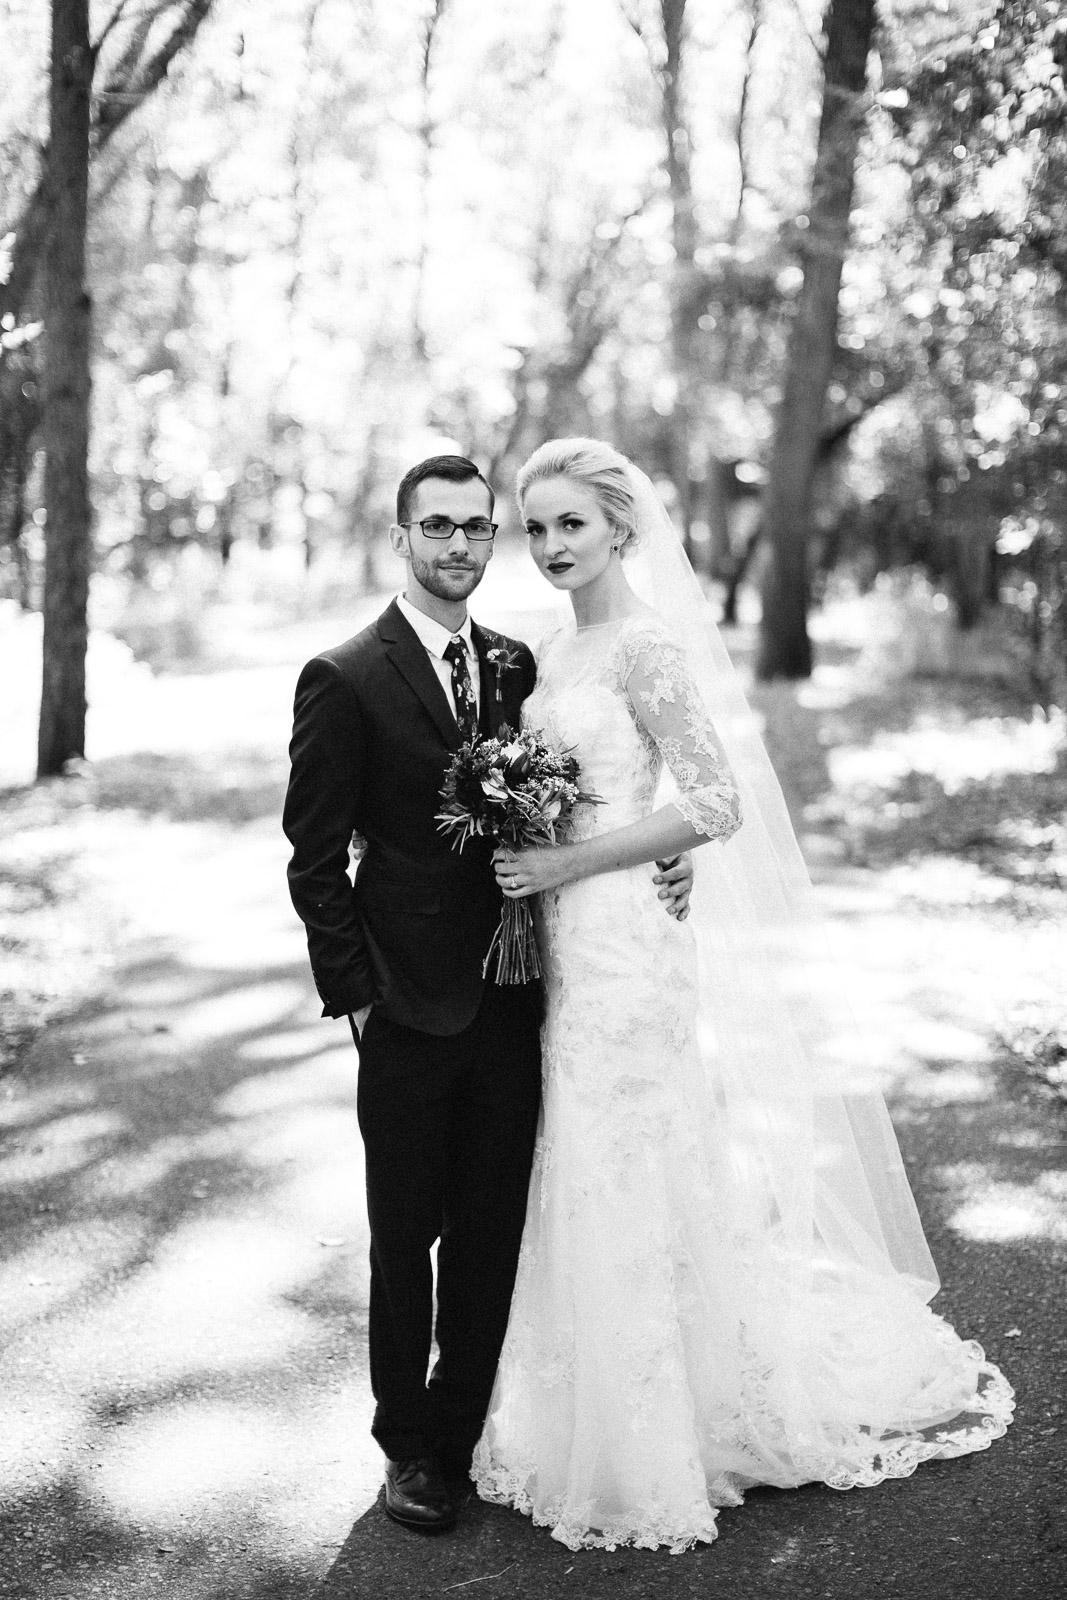 Jenna&Austin_SiouxFalls_Wedding_Photographer_046.jpg